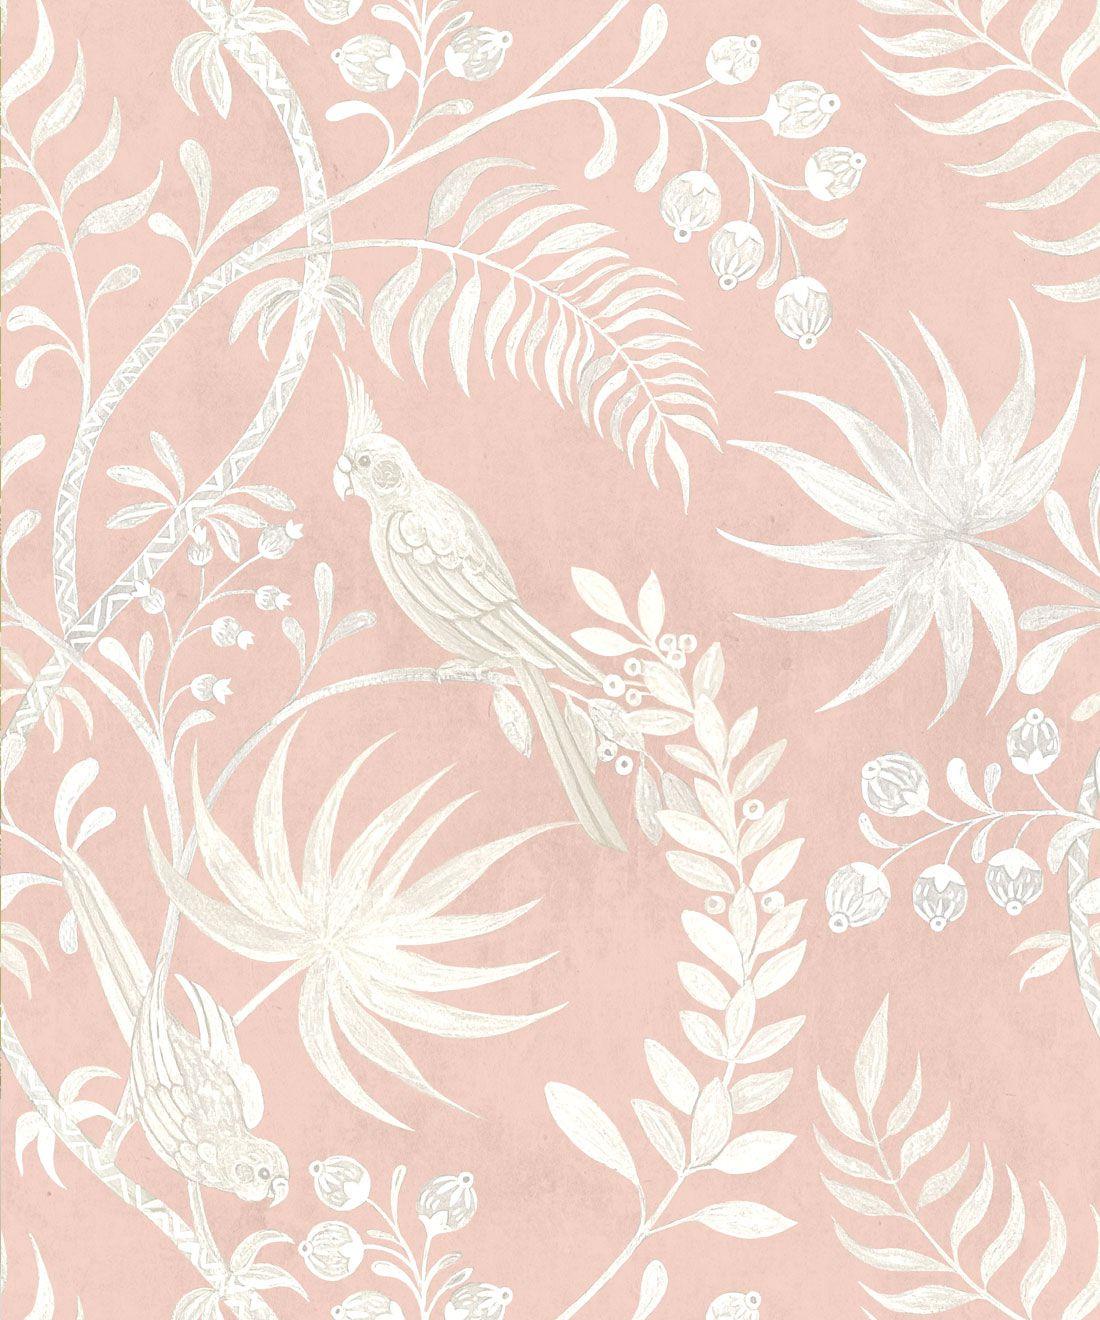 Tropicana Wallpaper • Dusty Pink • Swatch